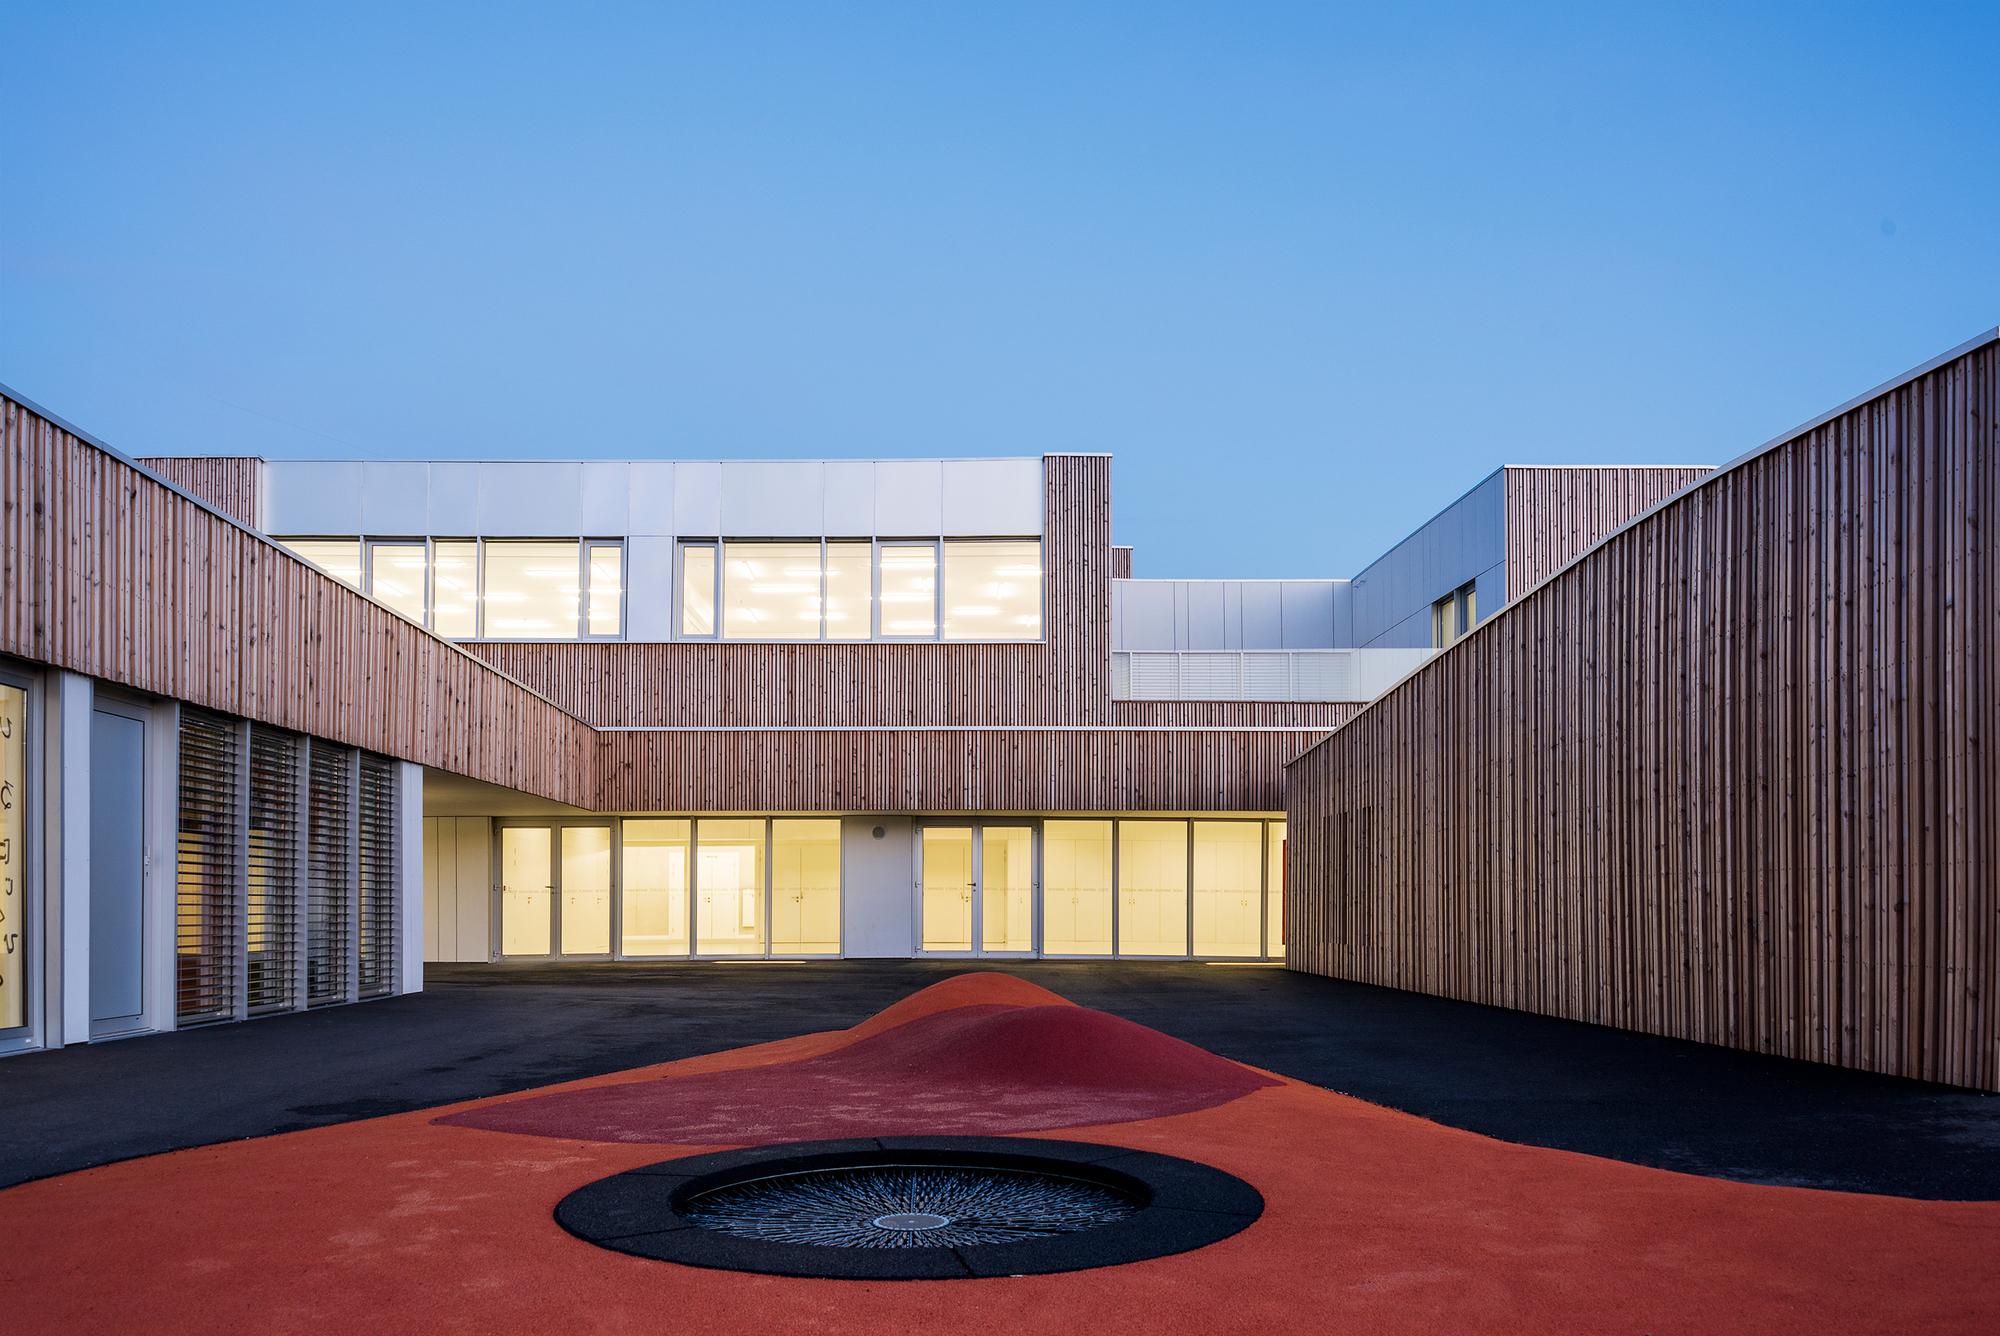 School group in france rouby hemmerl architectes for Architecte france